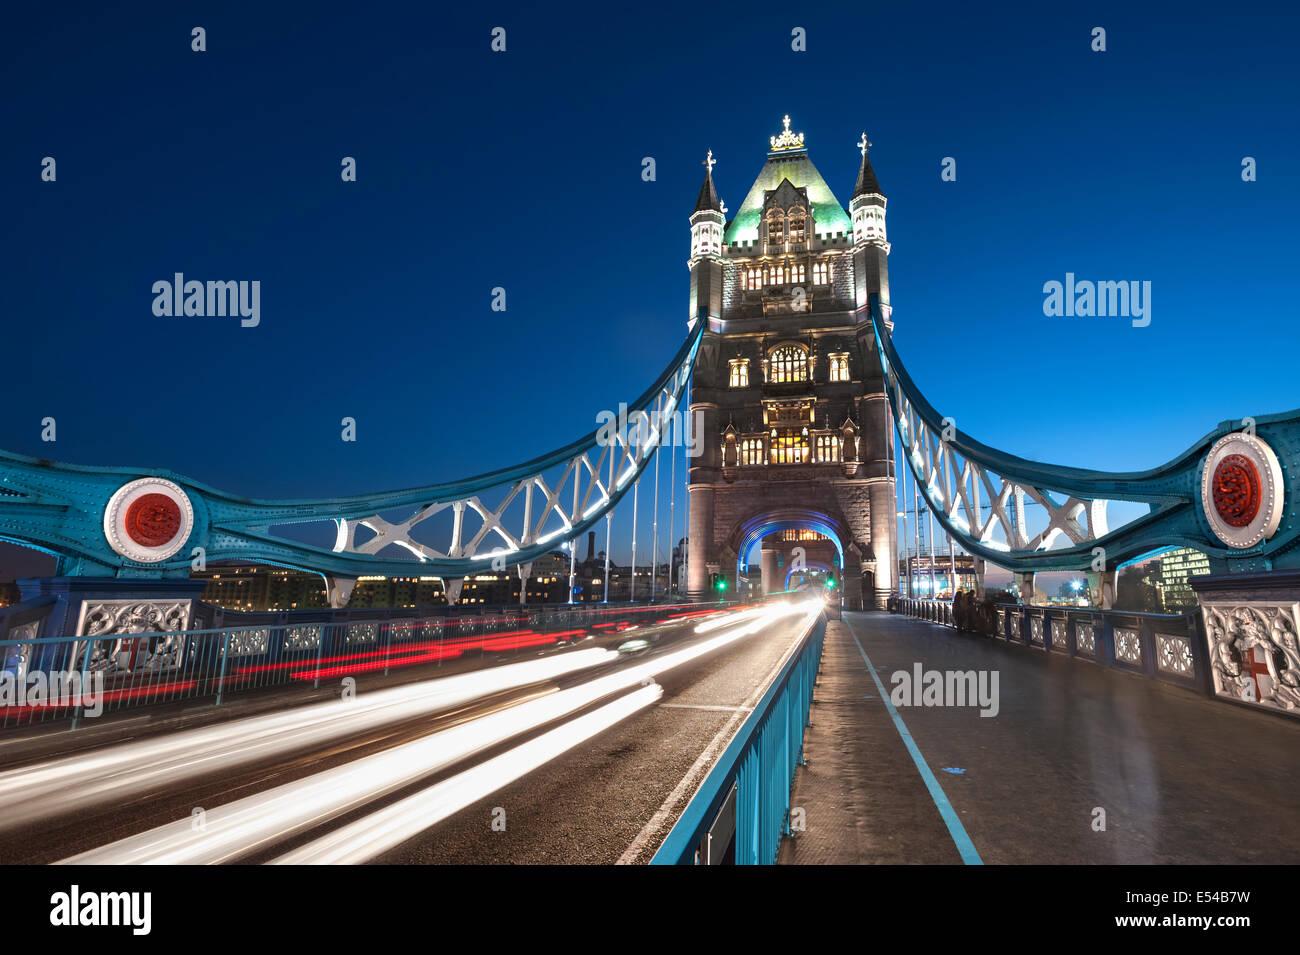 Tower Bridge at night with light trails London UK - Stock Image